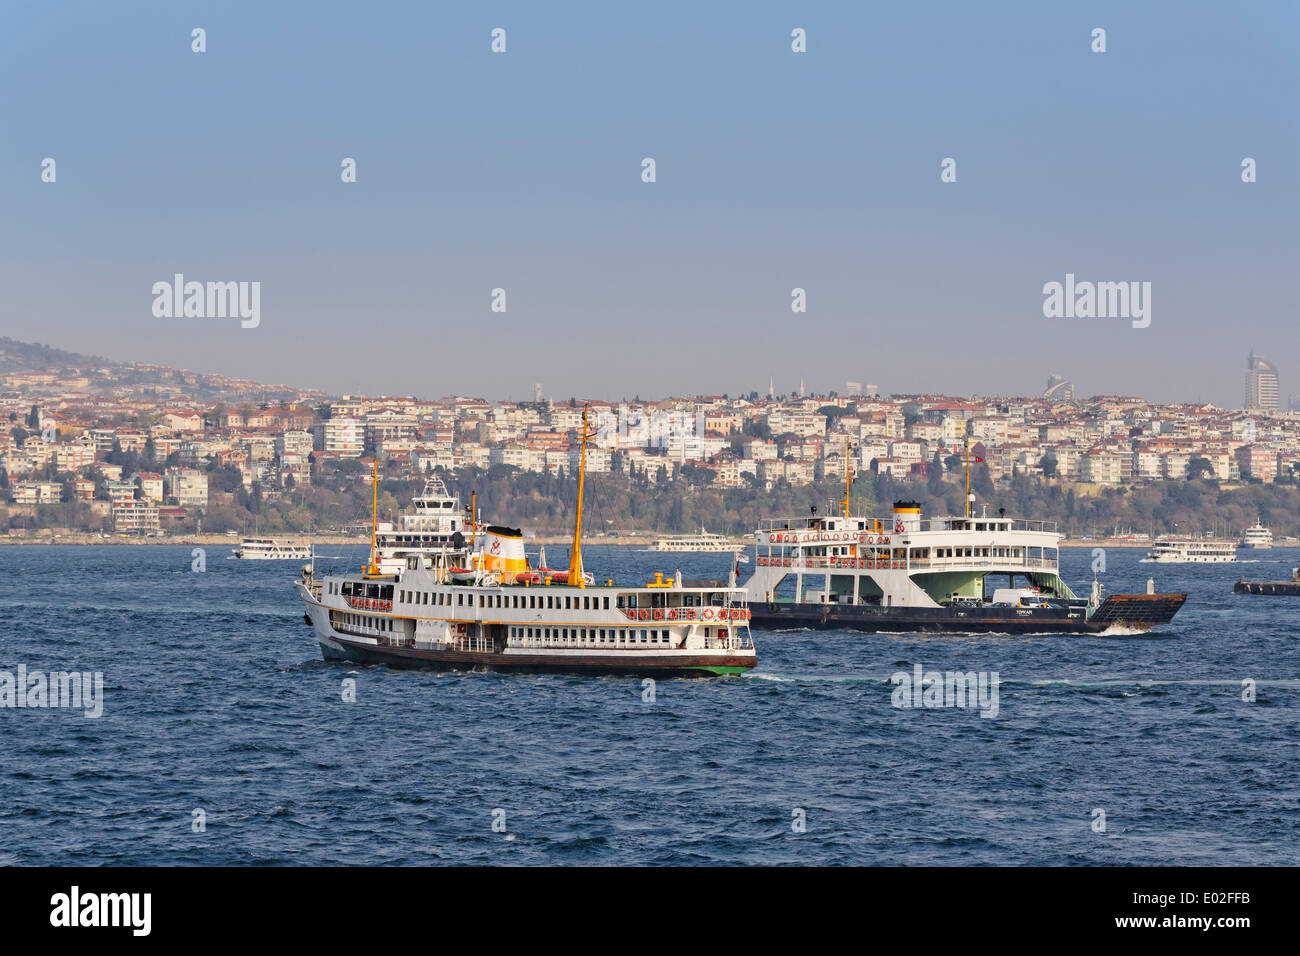 Ferries on the Bosphorus, view from Galata Bridge to the Üsküdar district, Istanbul, Turkey - Stock Image